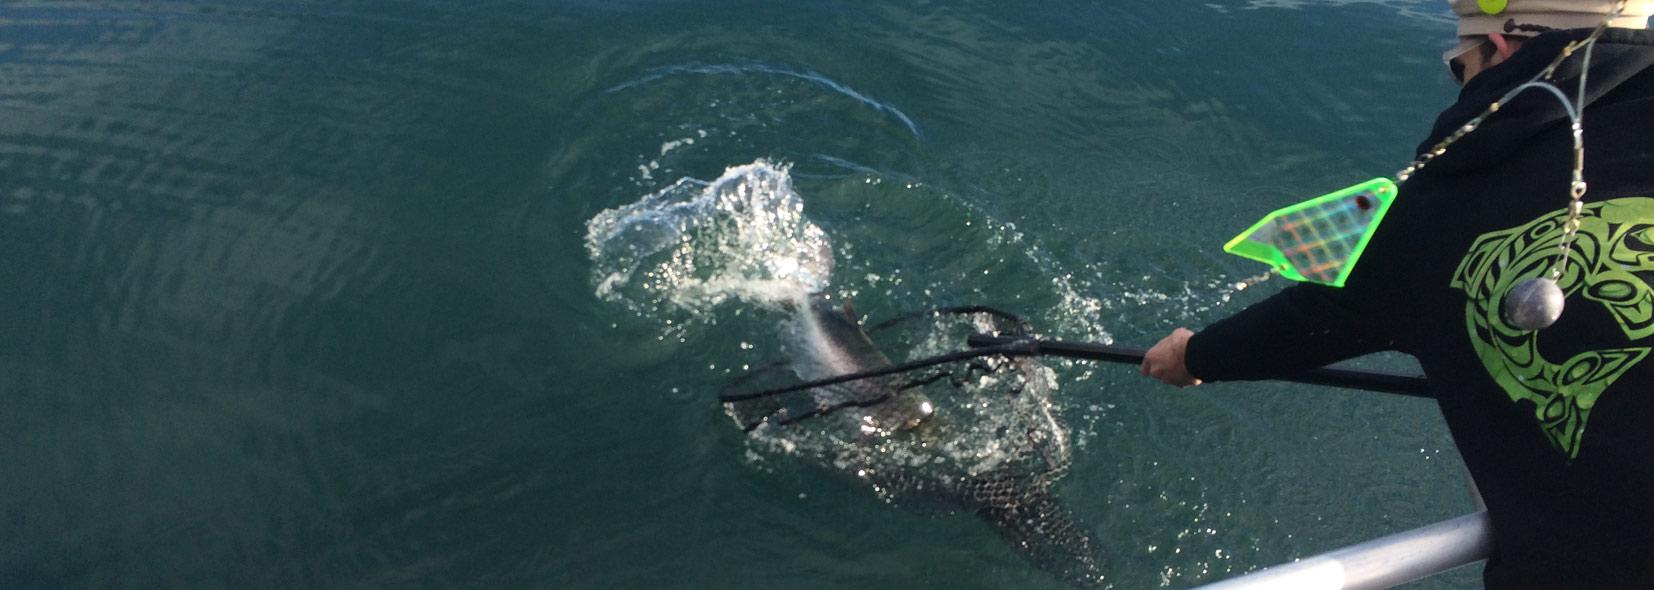 Halibut Lingcod Salmon Fishing In Seward And Kenai